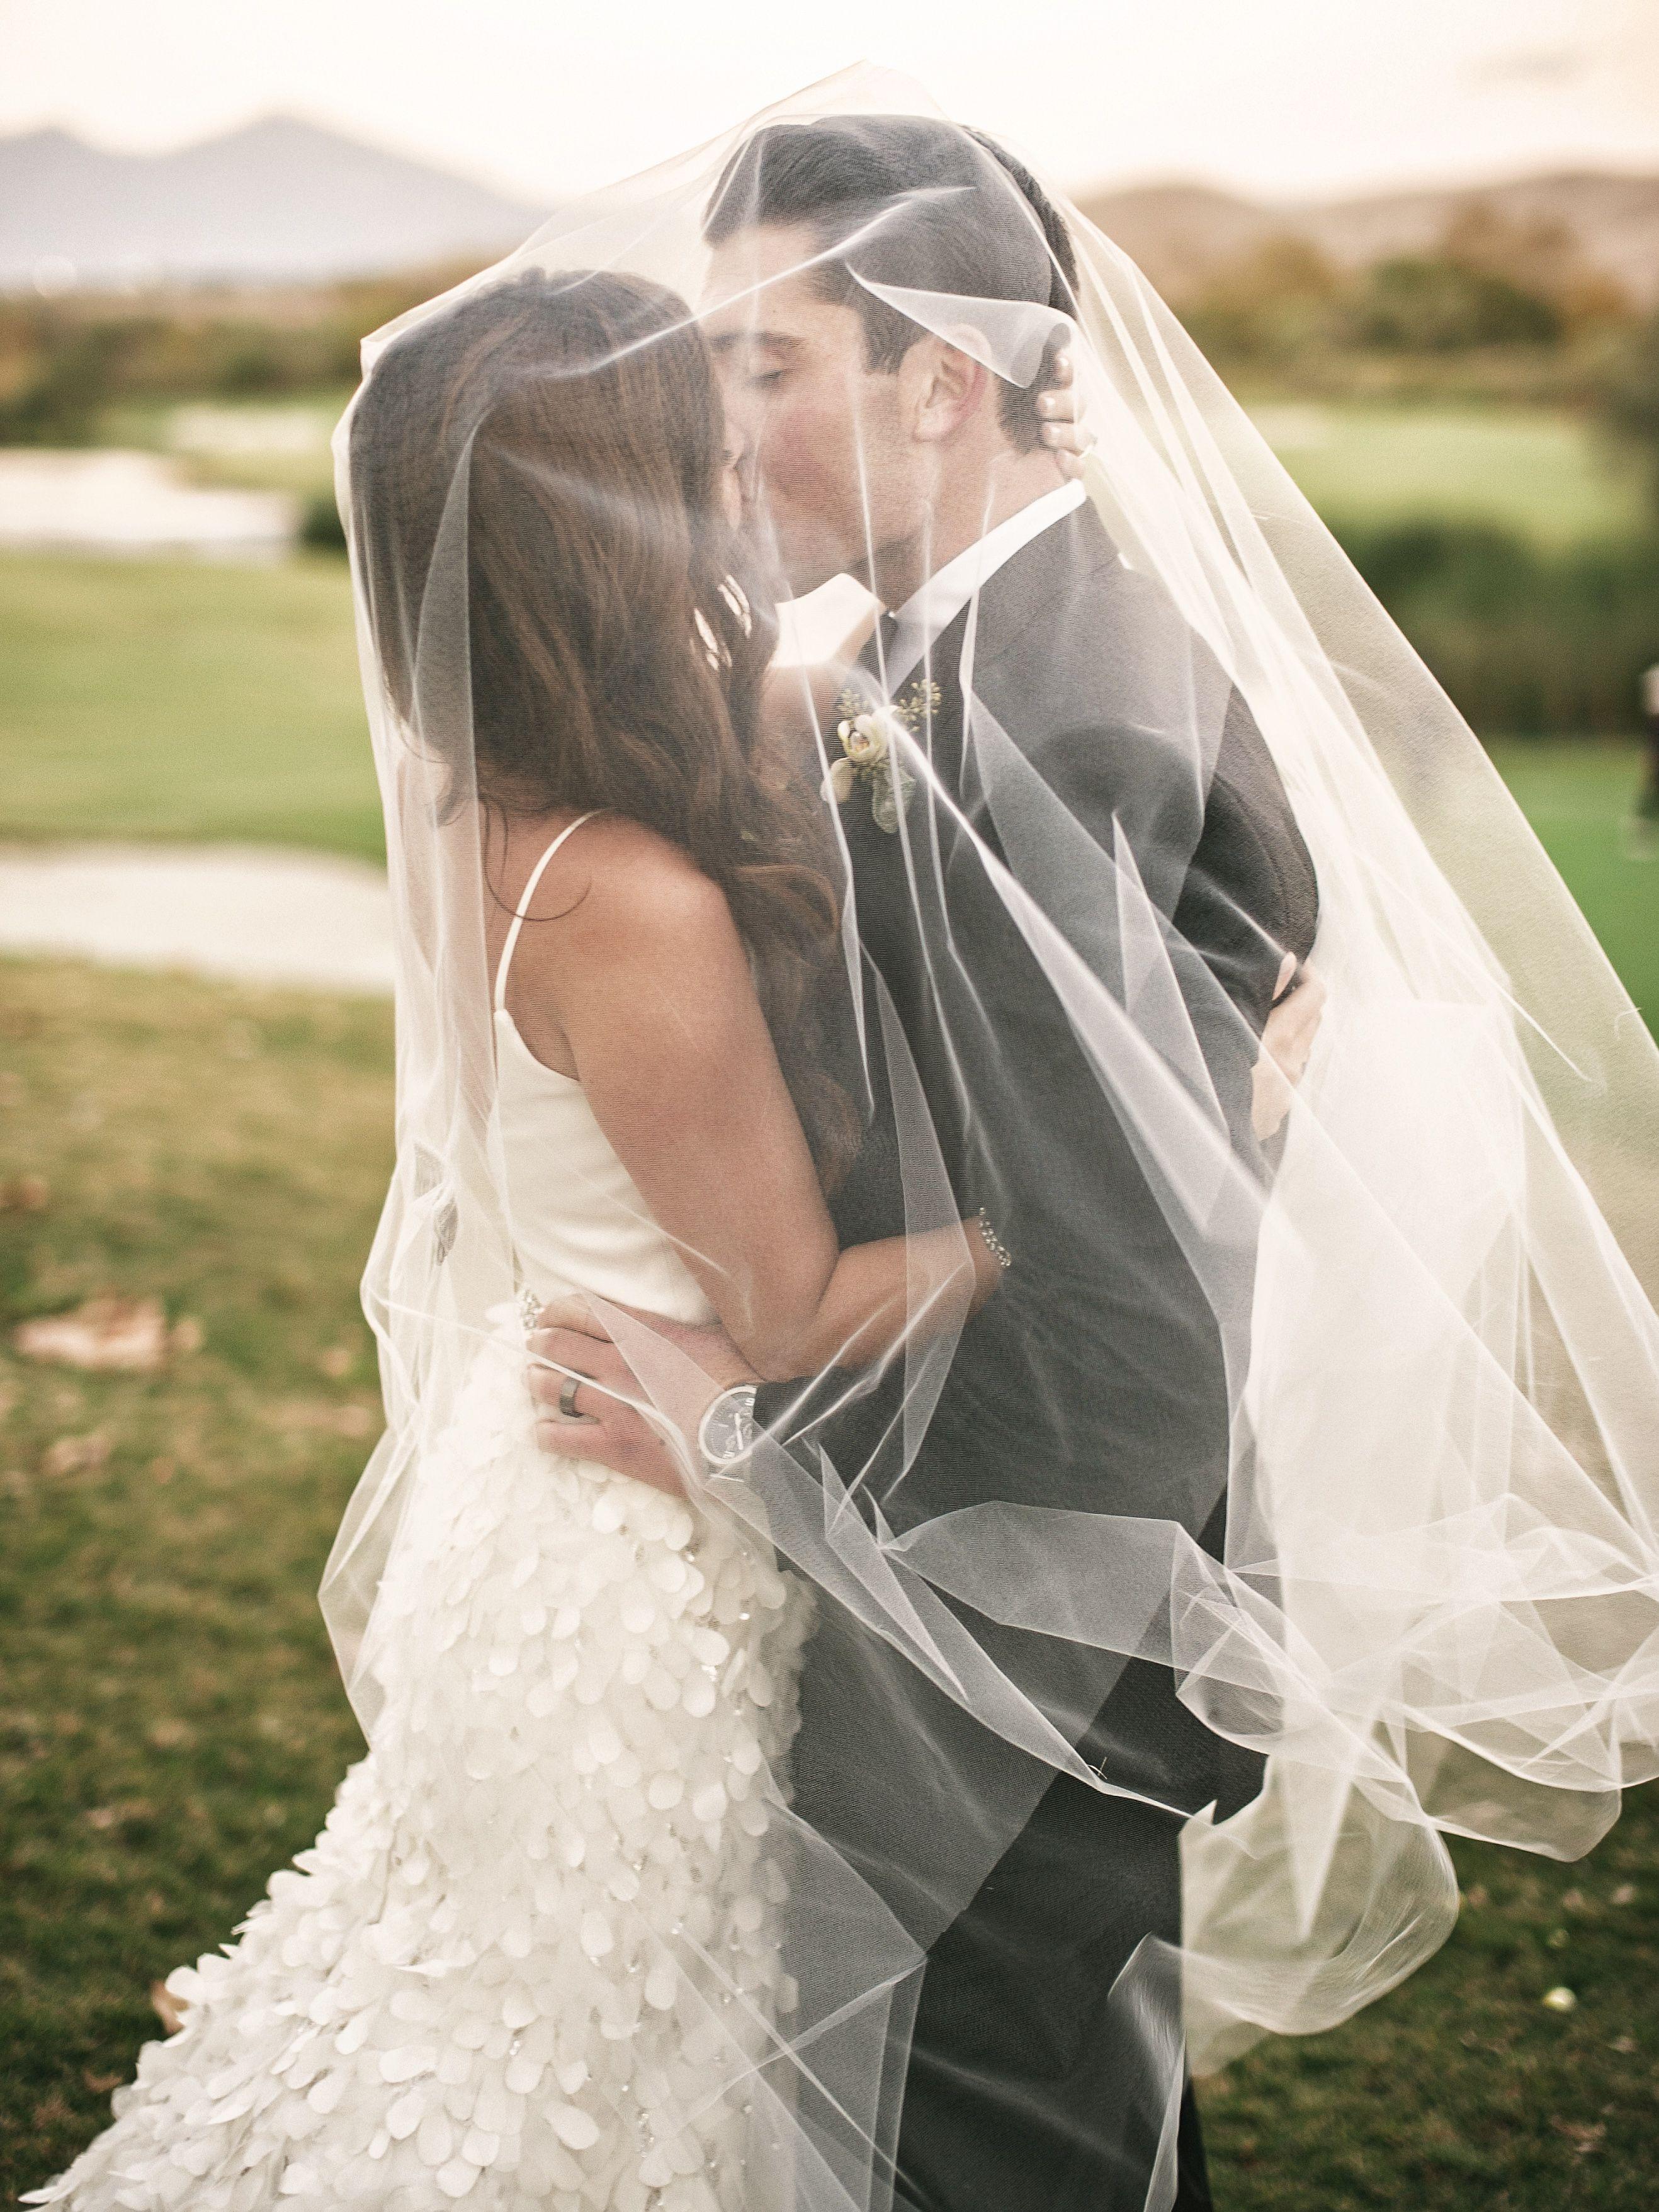 Under veil kisses